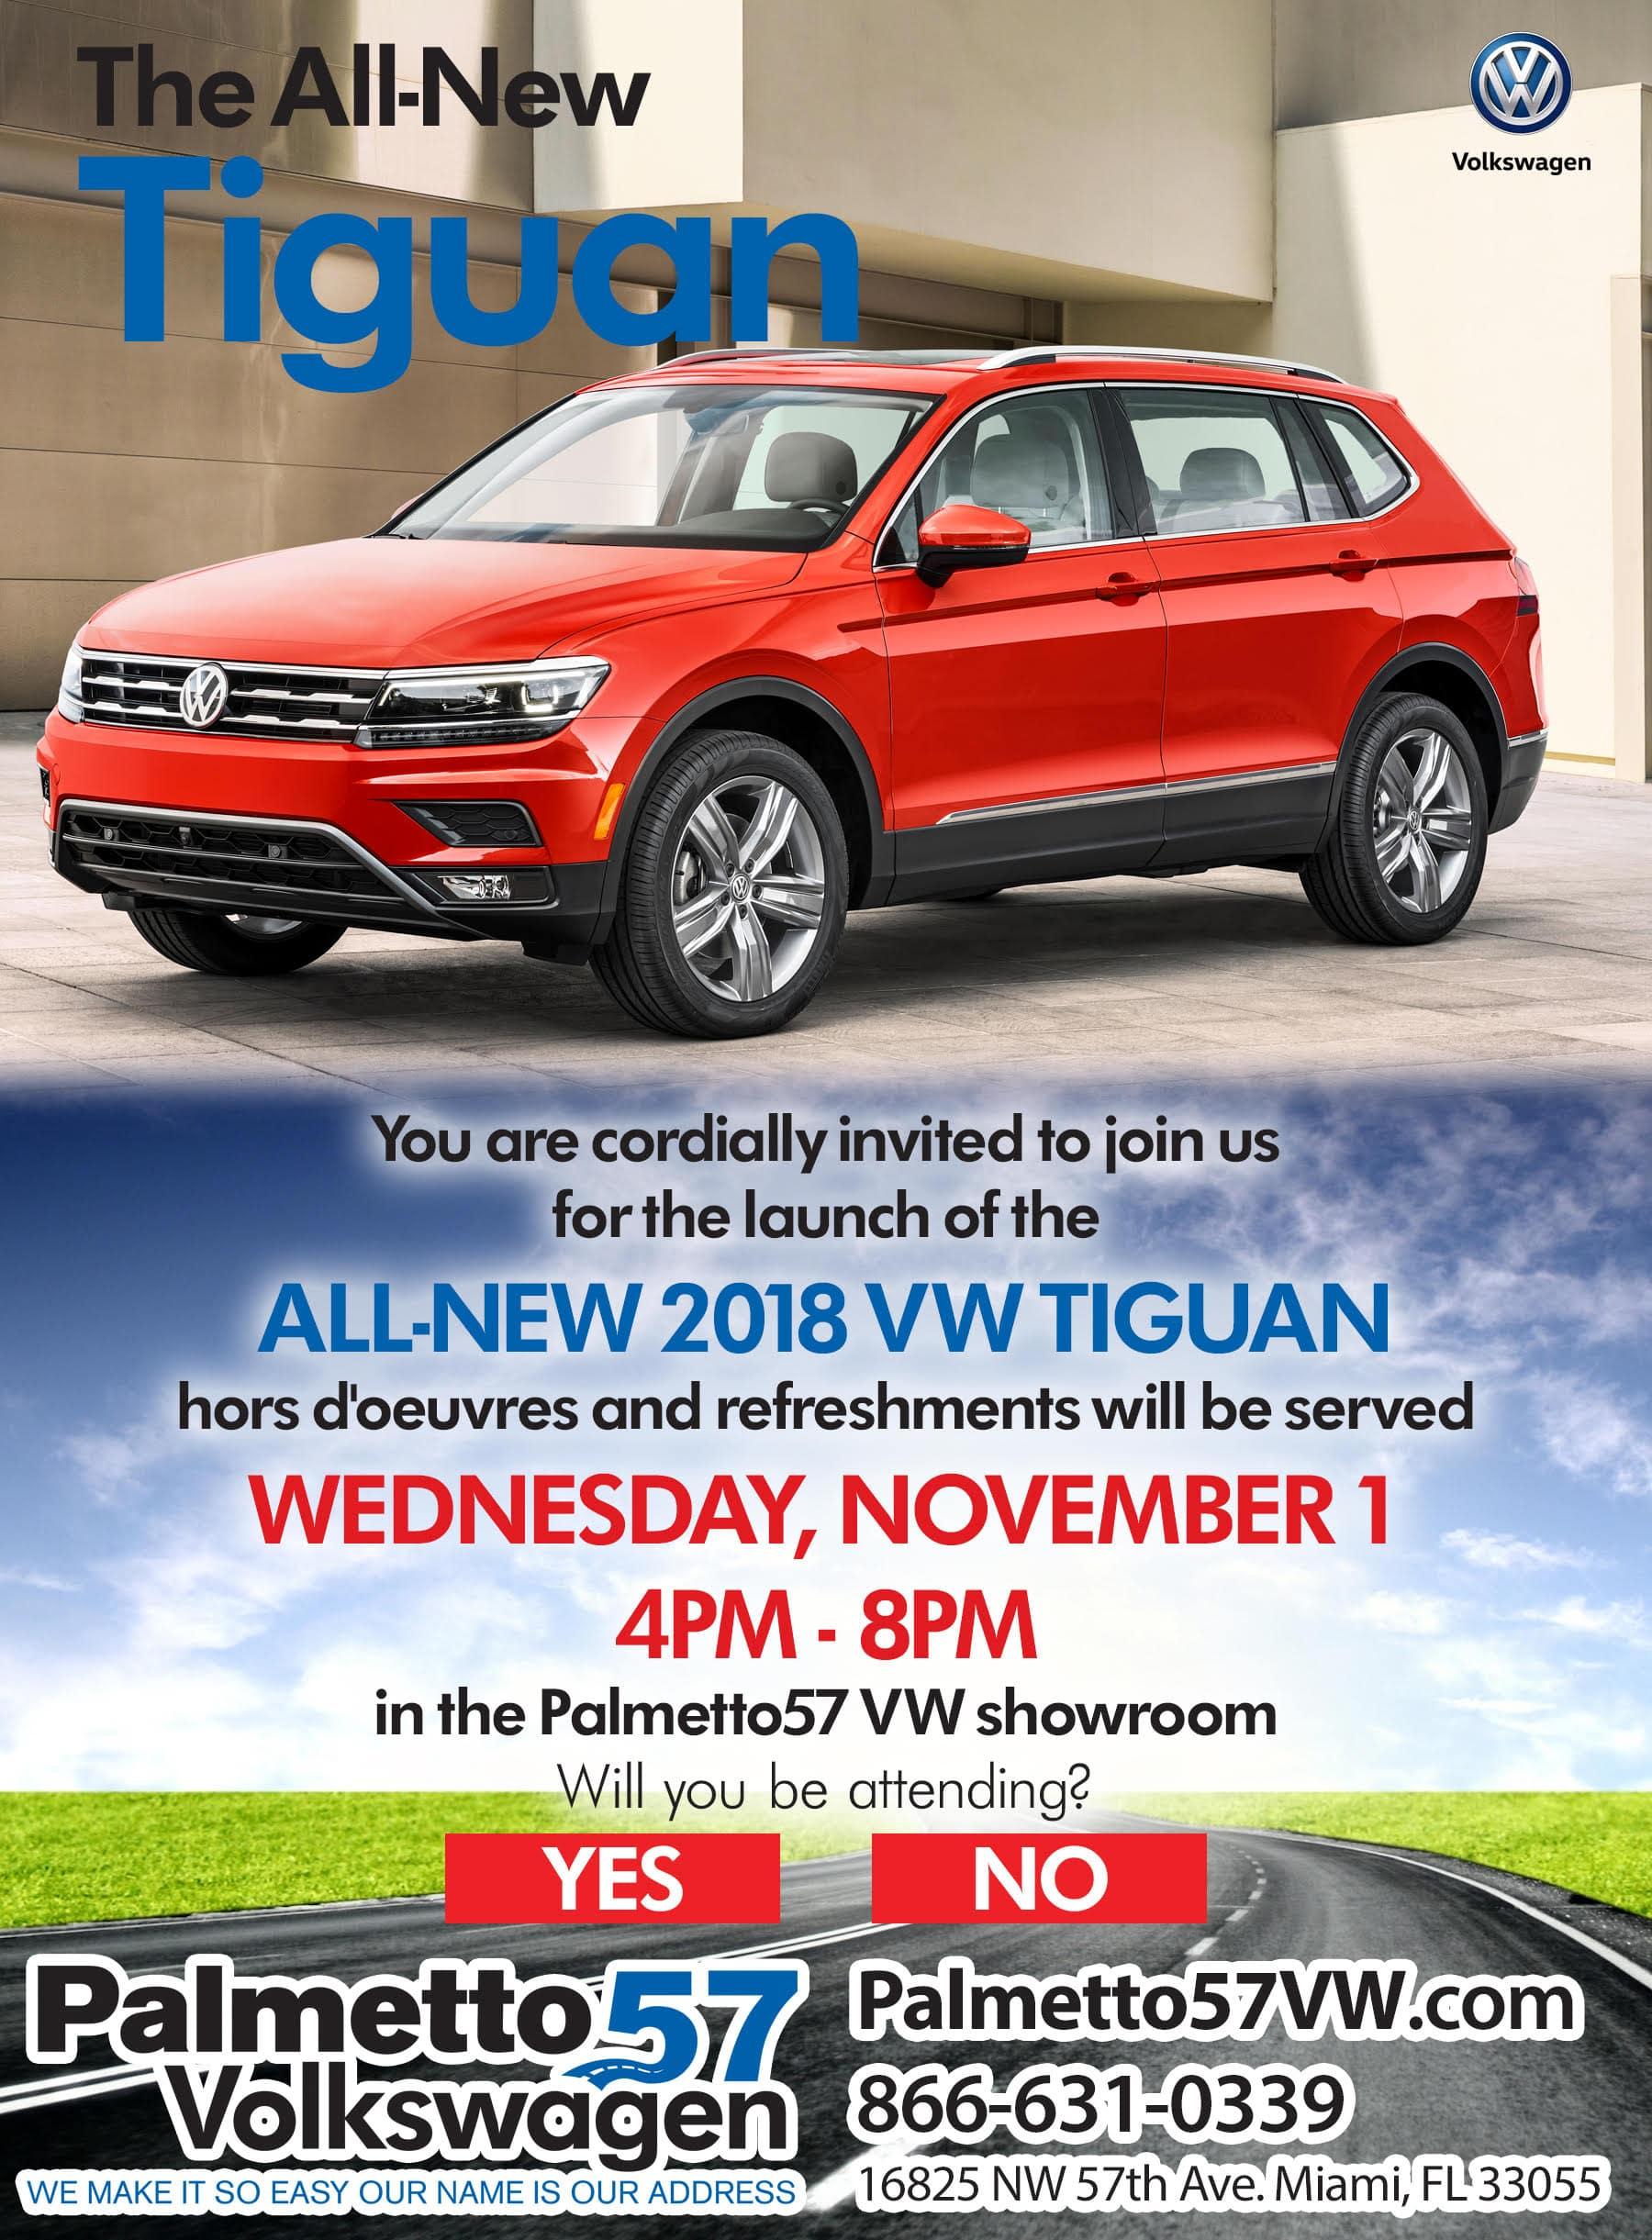 Palmetto57 Volkswagen Tiguan Launch Party RSVP